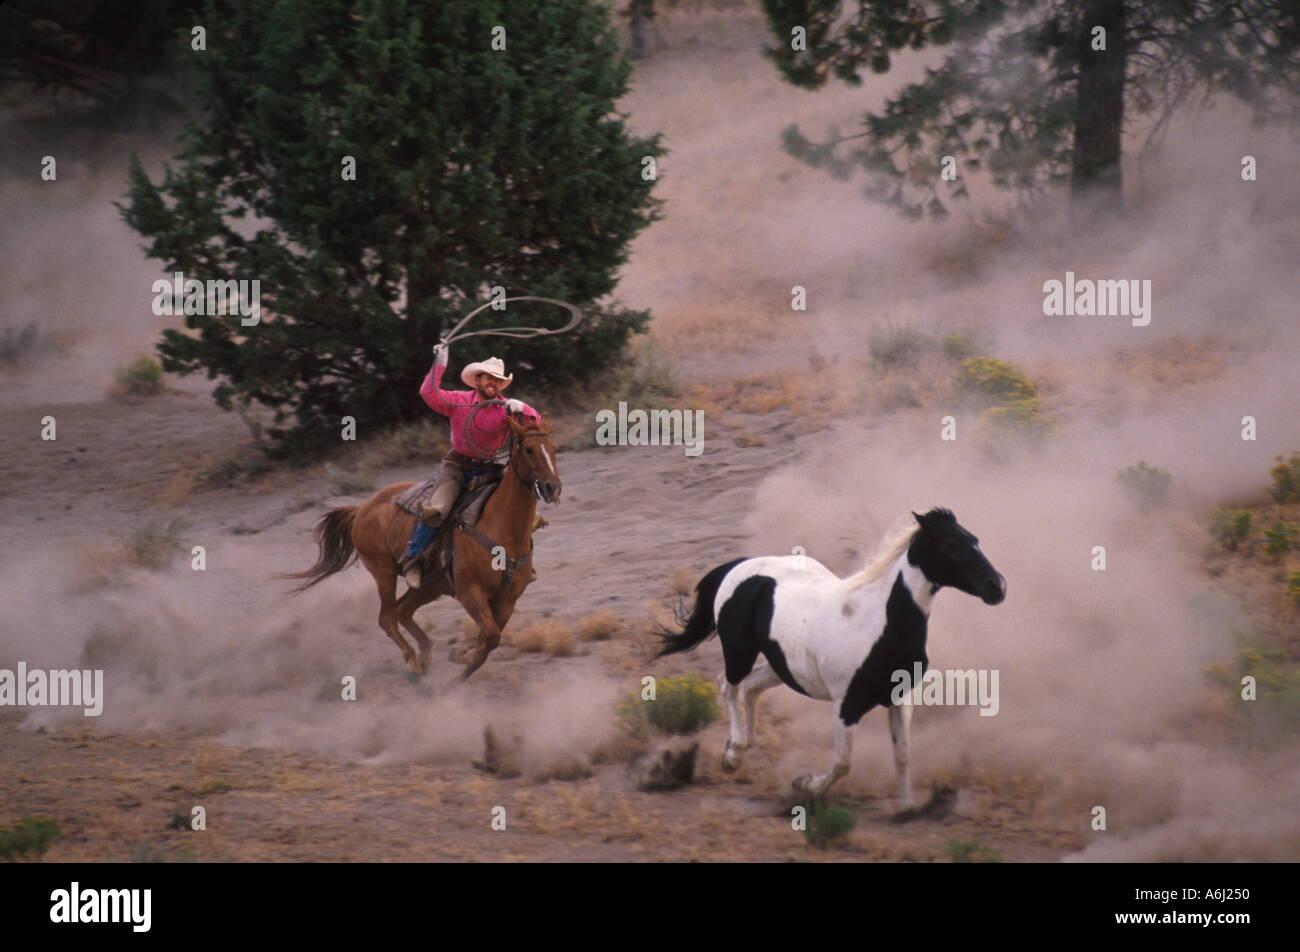 Cowboy Roping Wild Horse - Stock Image